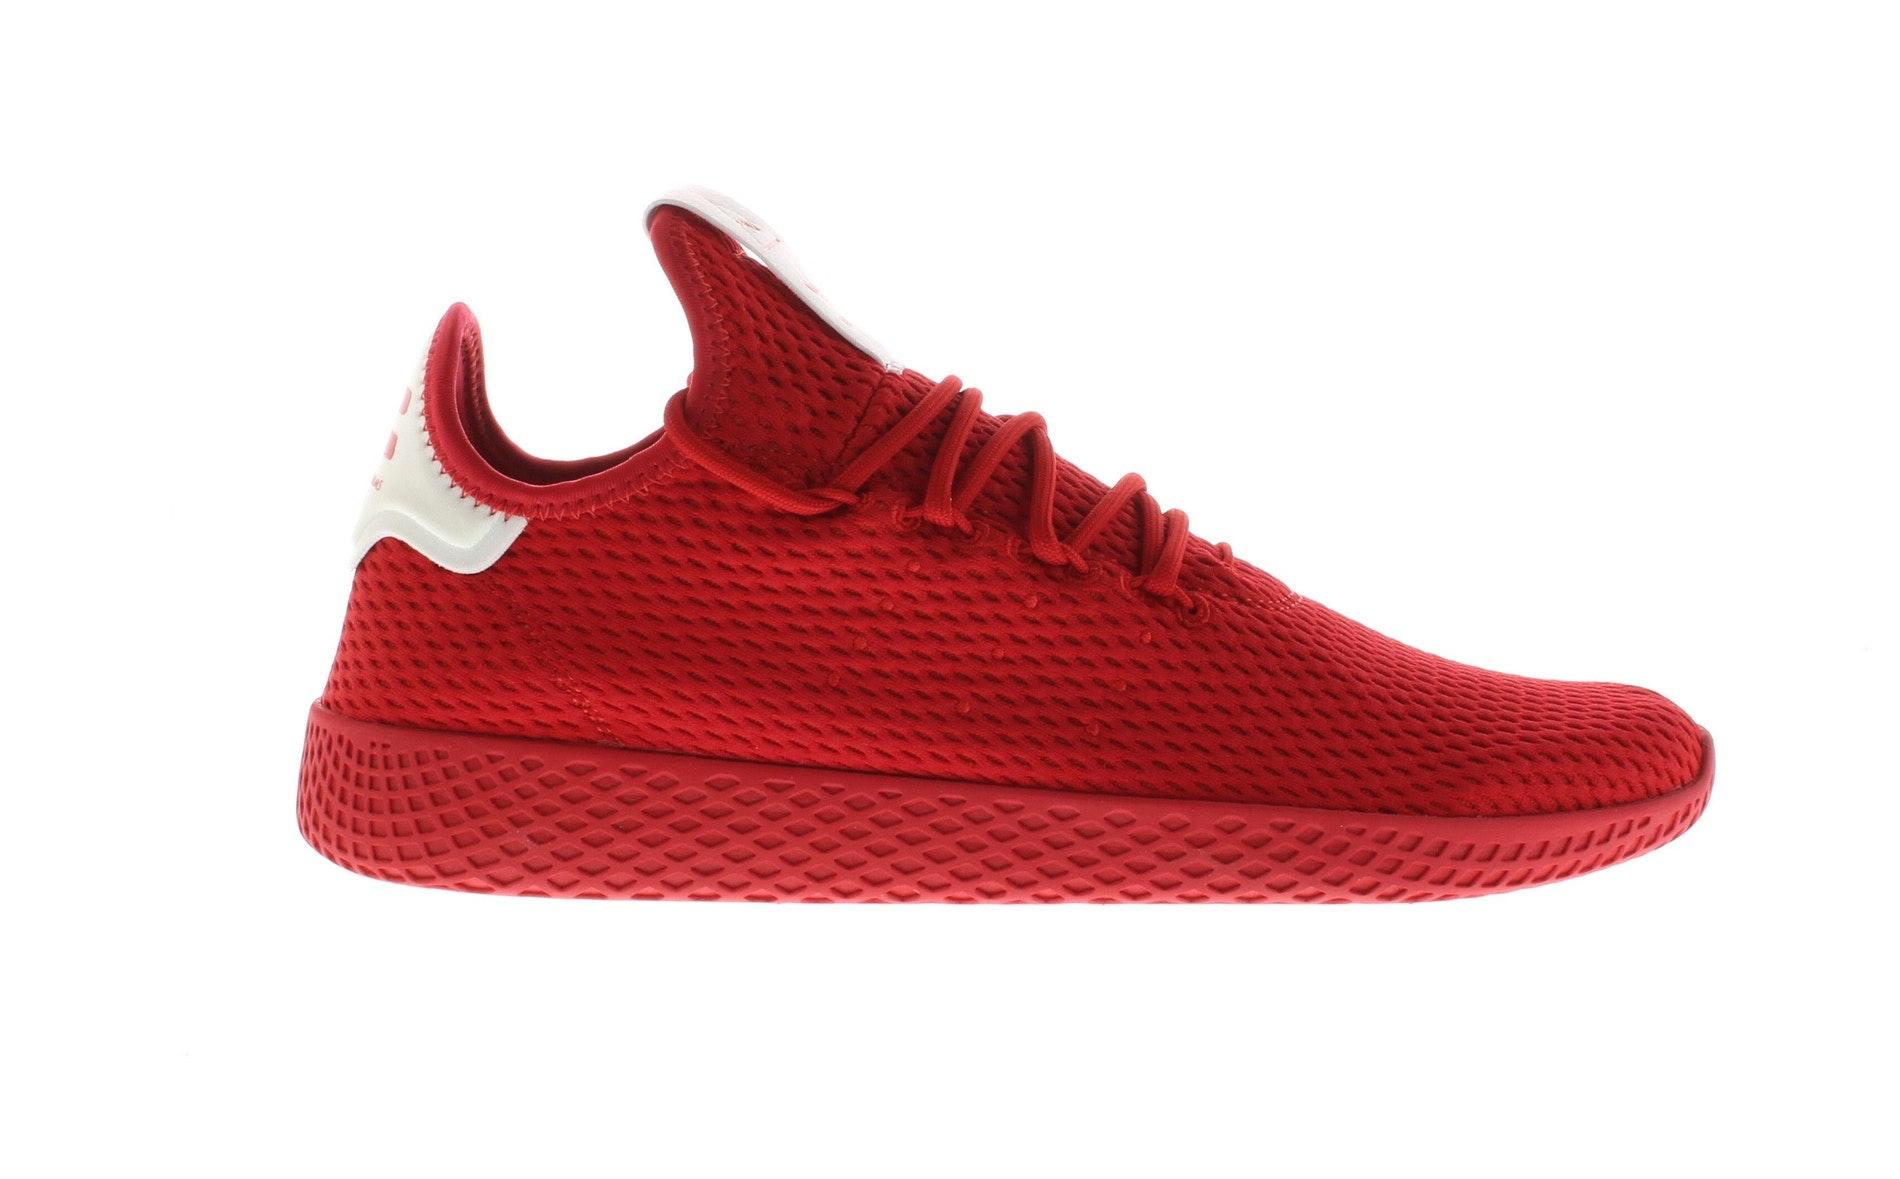 adidas Tennis Hu Pharrell Solid Scarlet